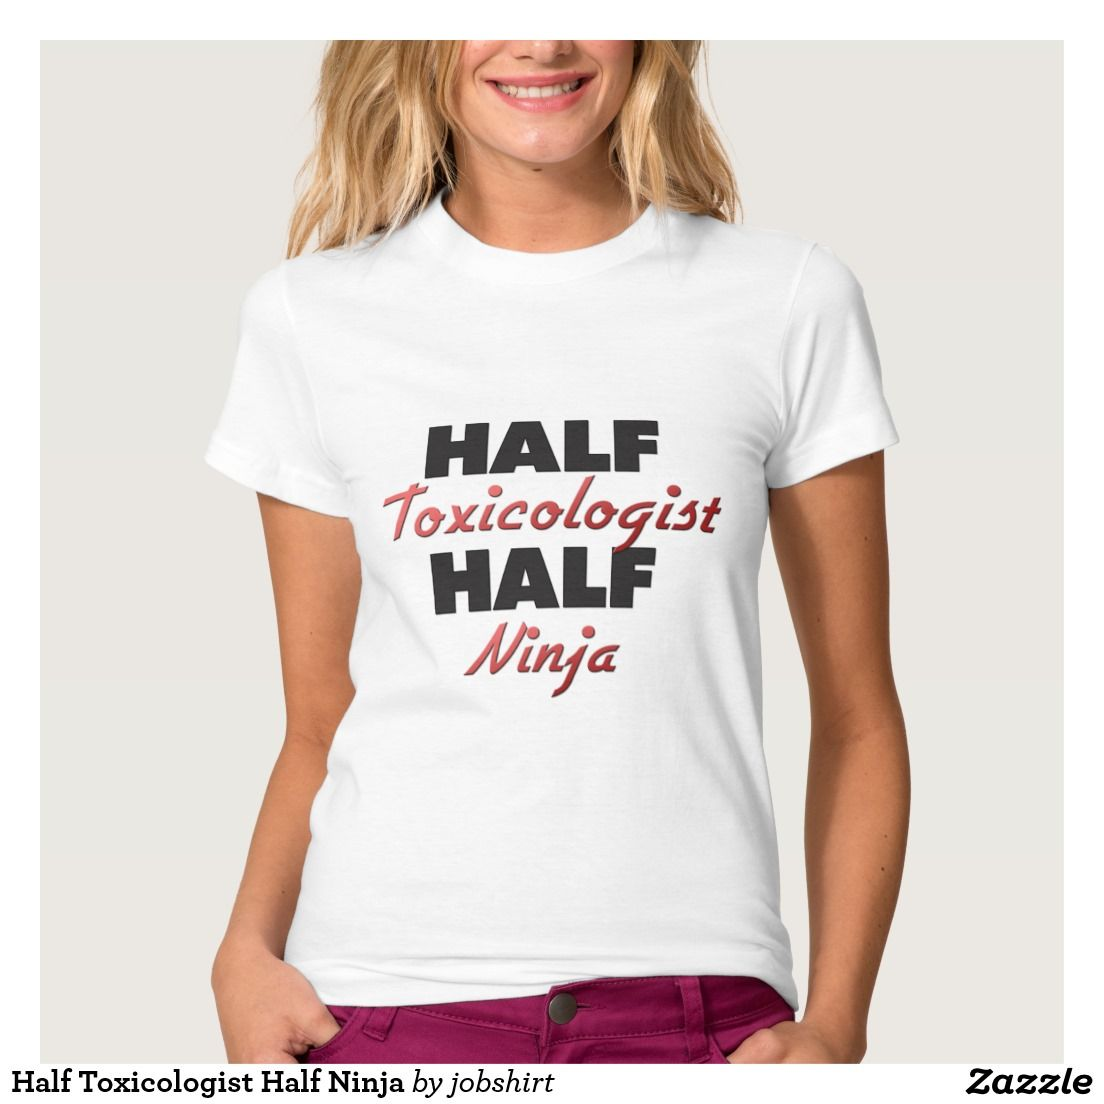 Half Toxicologist Half Ninja T-shirt